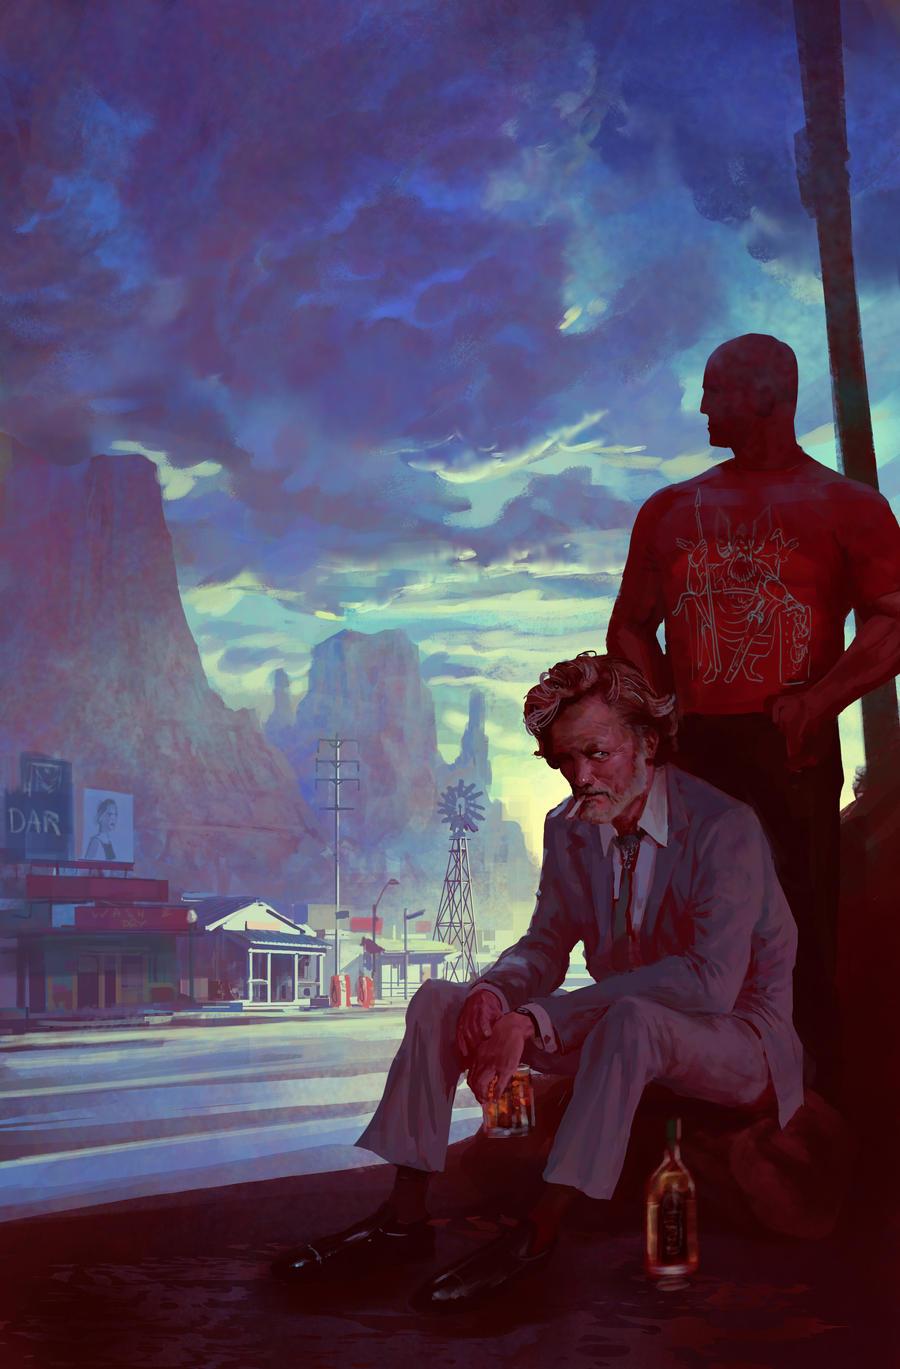 American gods by Neil Gaiman by MarcSimonetti